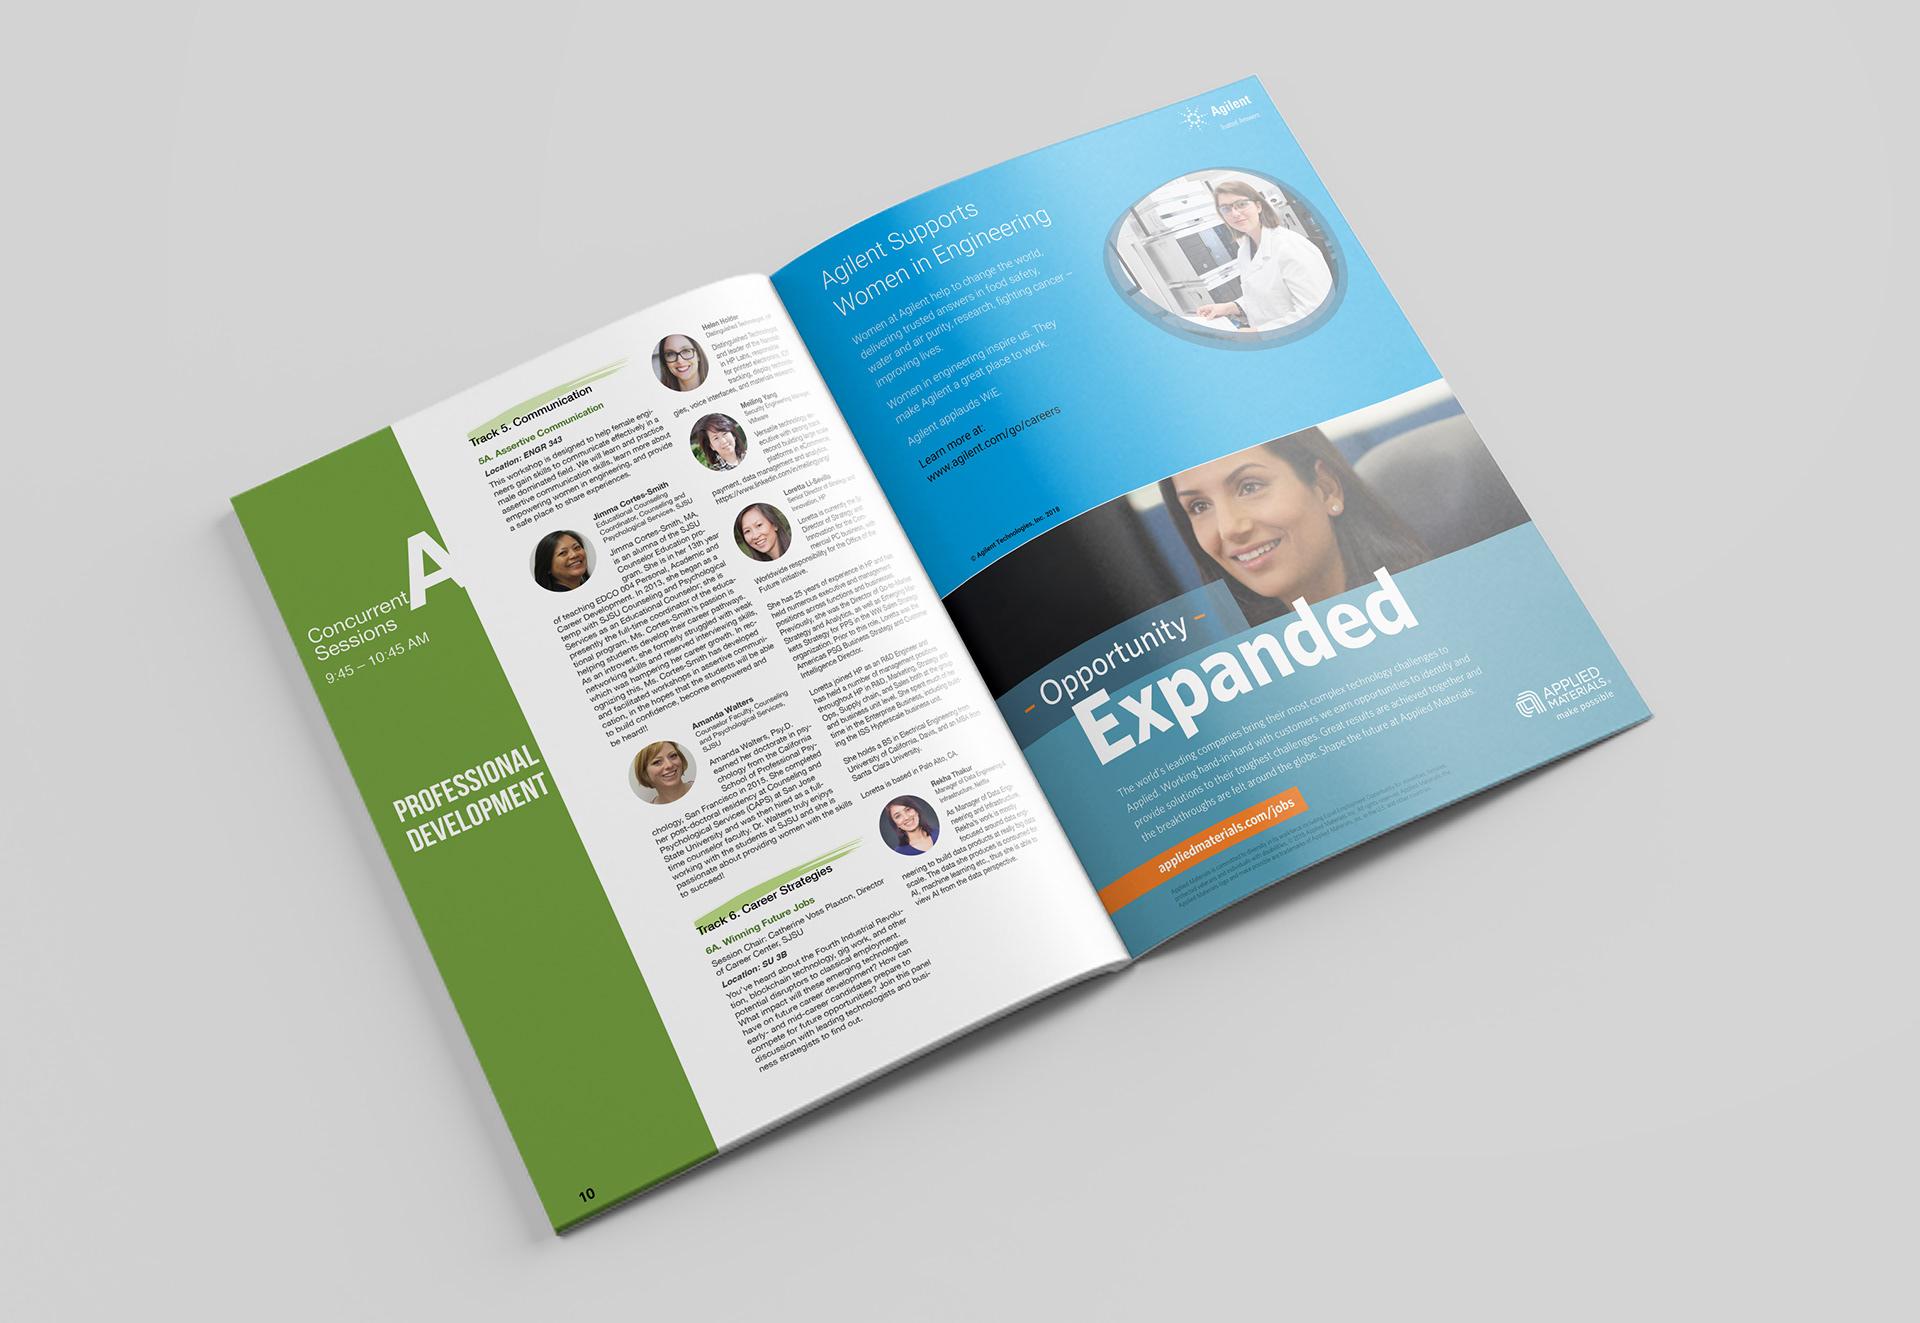 yanshu gu 2018 women in engineering conference brochure design